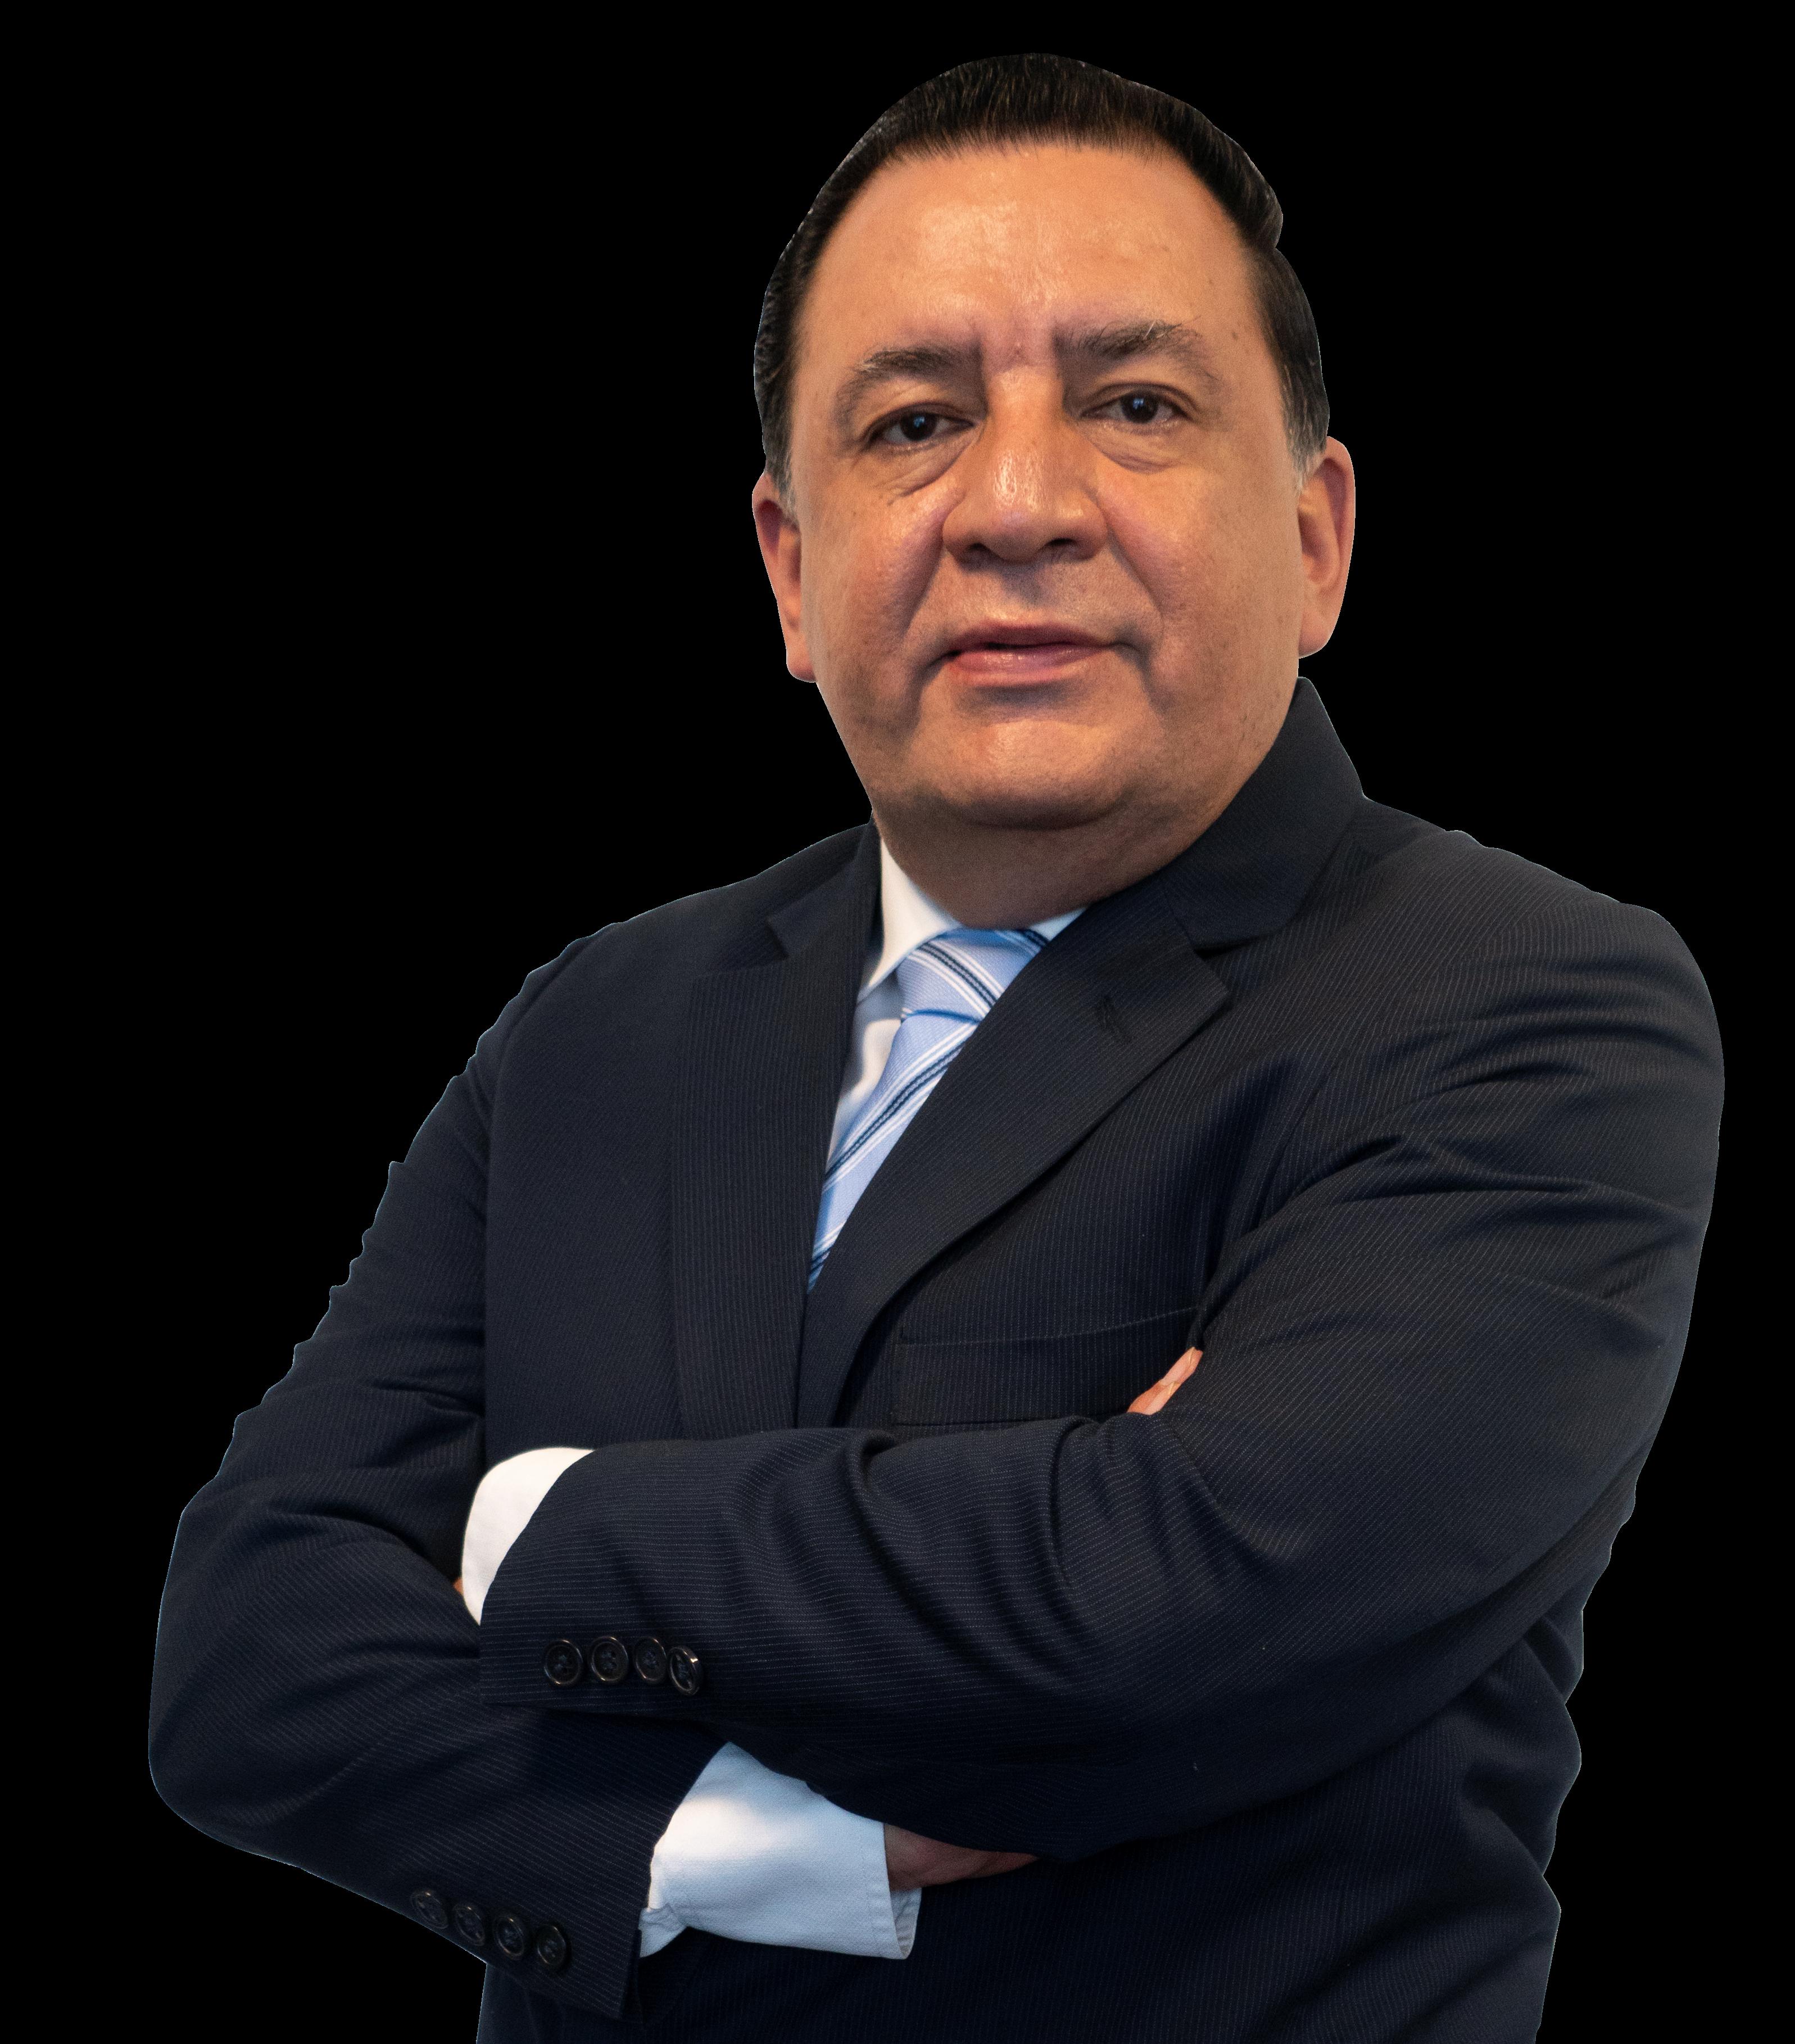 Jaime Raul Mendoza Gacon